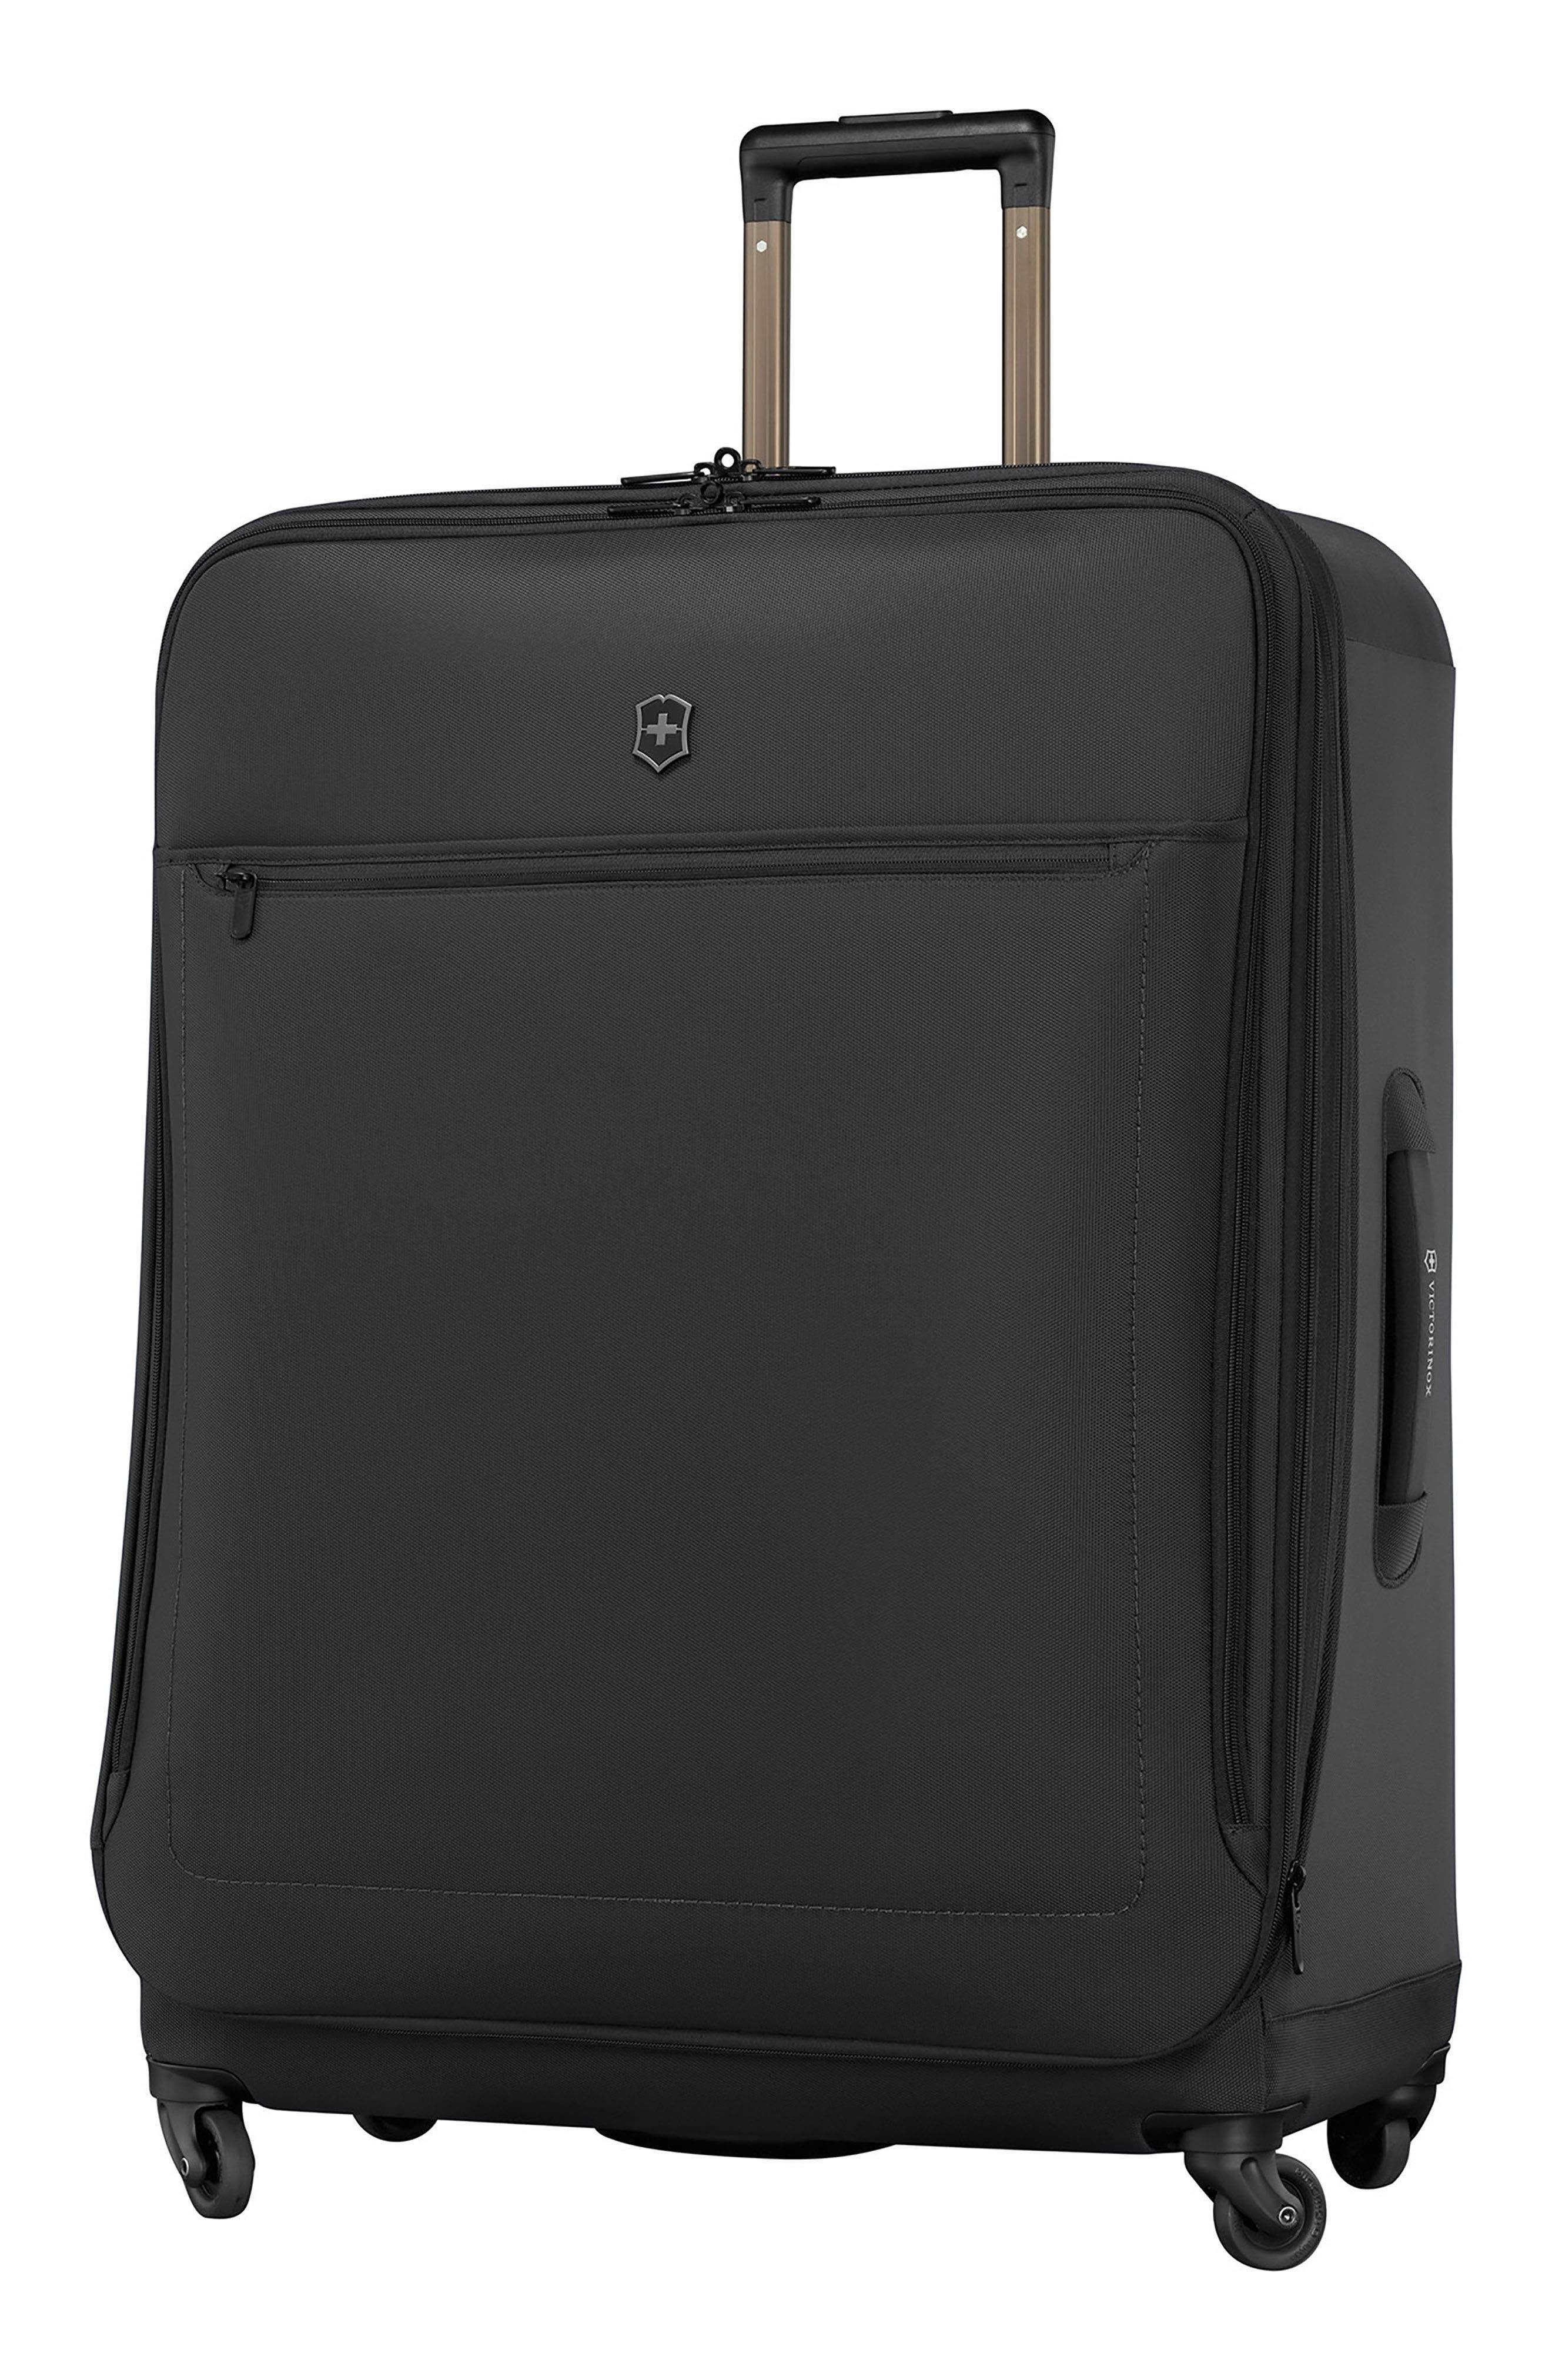 Victorinox Swiss Army® Avolve 3.0 XL 32 Inch Wheeled Packing Case